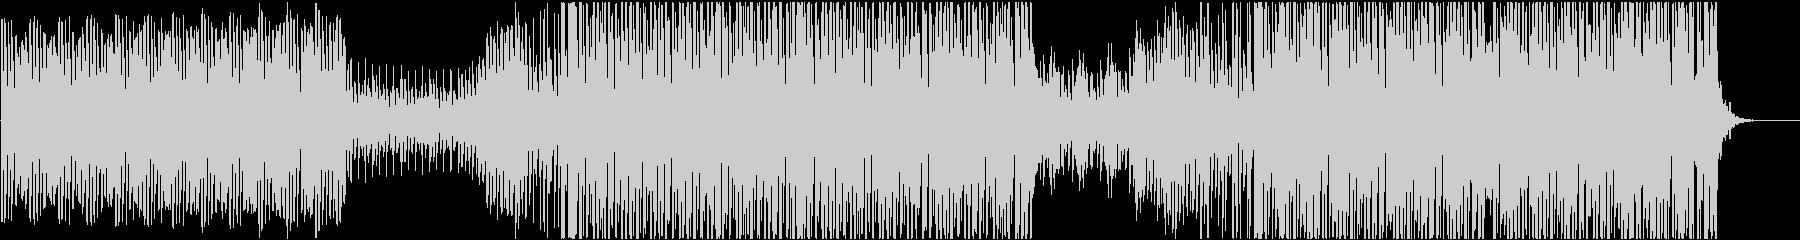 EDM おしゃれなエレクトロスウィングの未再生の波形